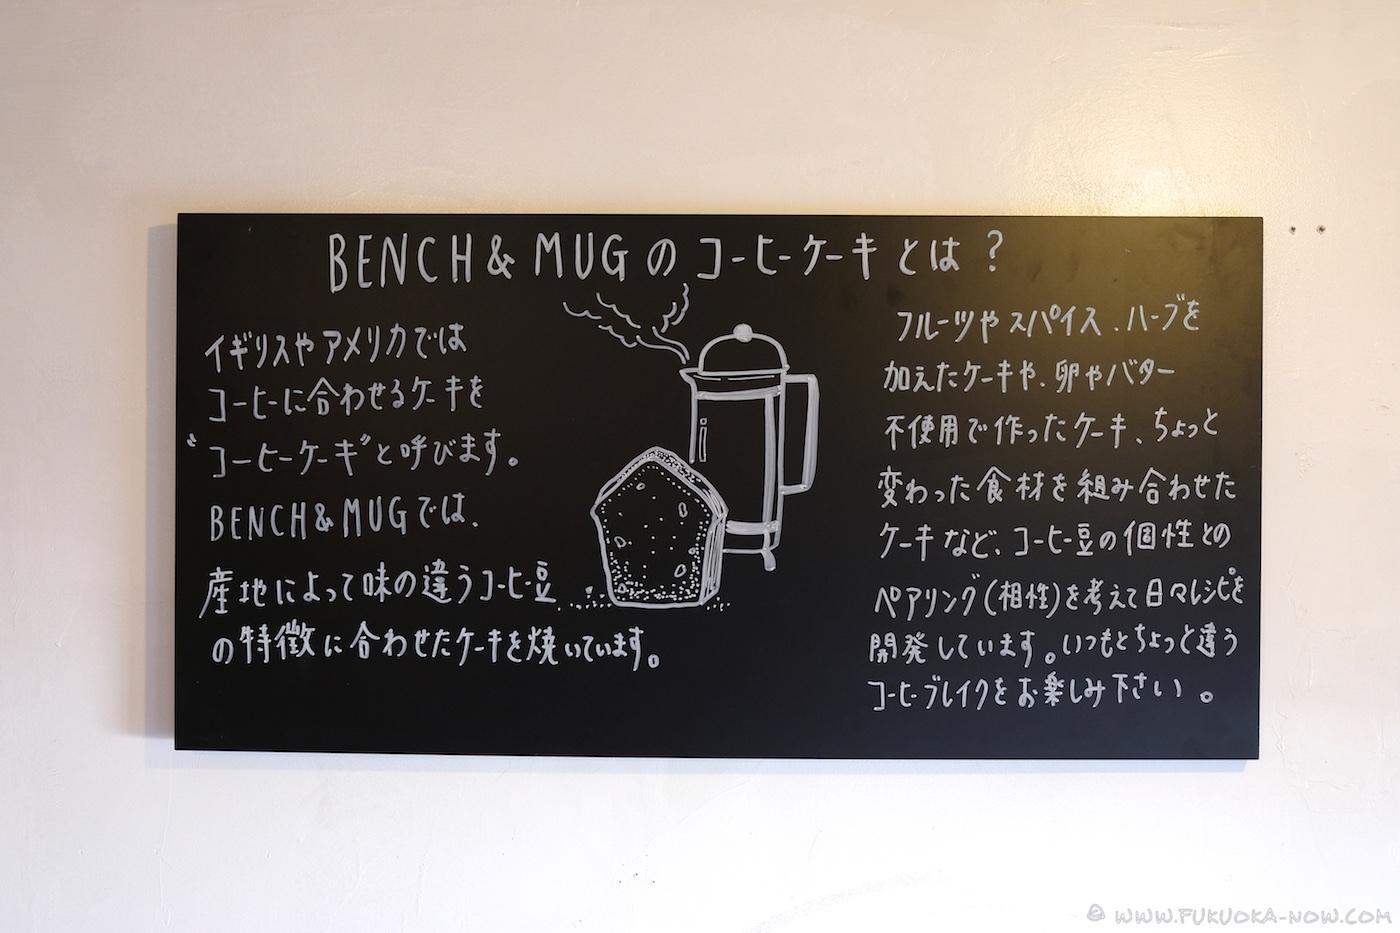 bench & mug, itoshima, cakes, coffee, fukuoka